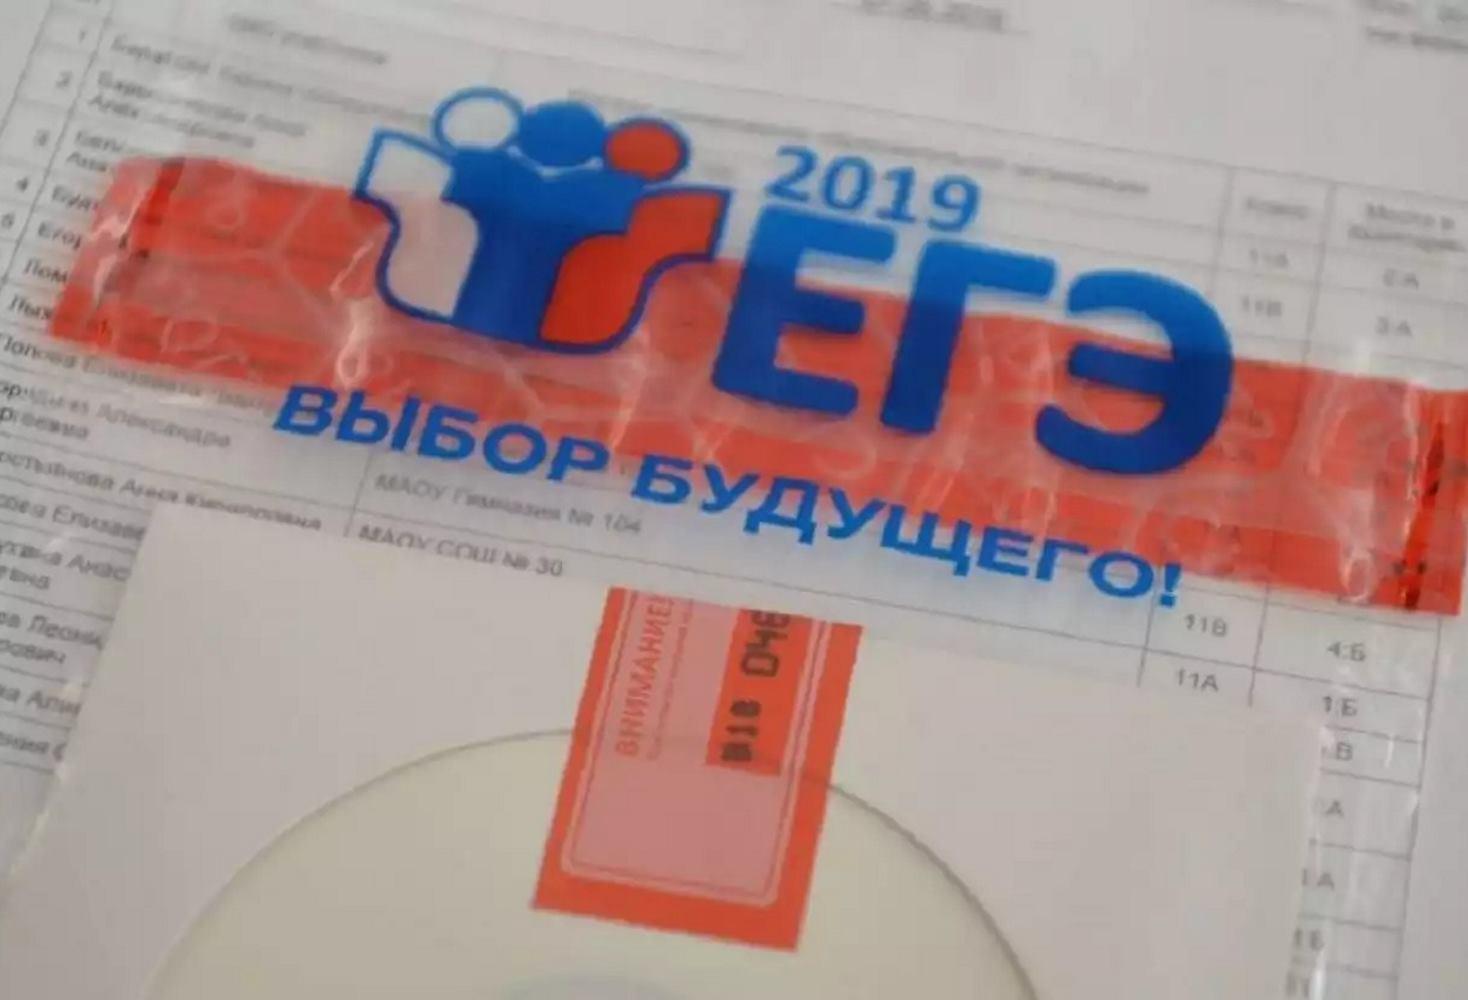 rosobrnadzor-nazval-srednij-rezultat-po-summe-treh-ege-v-2019-godu